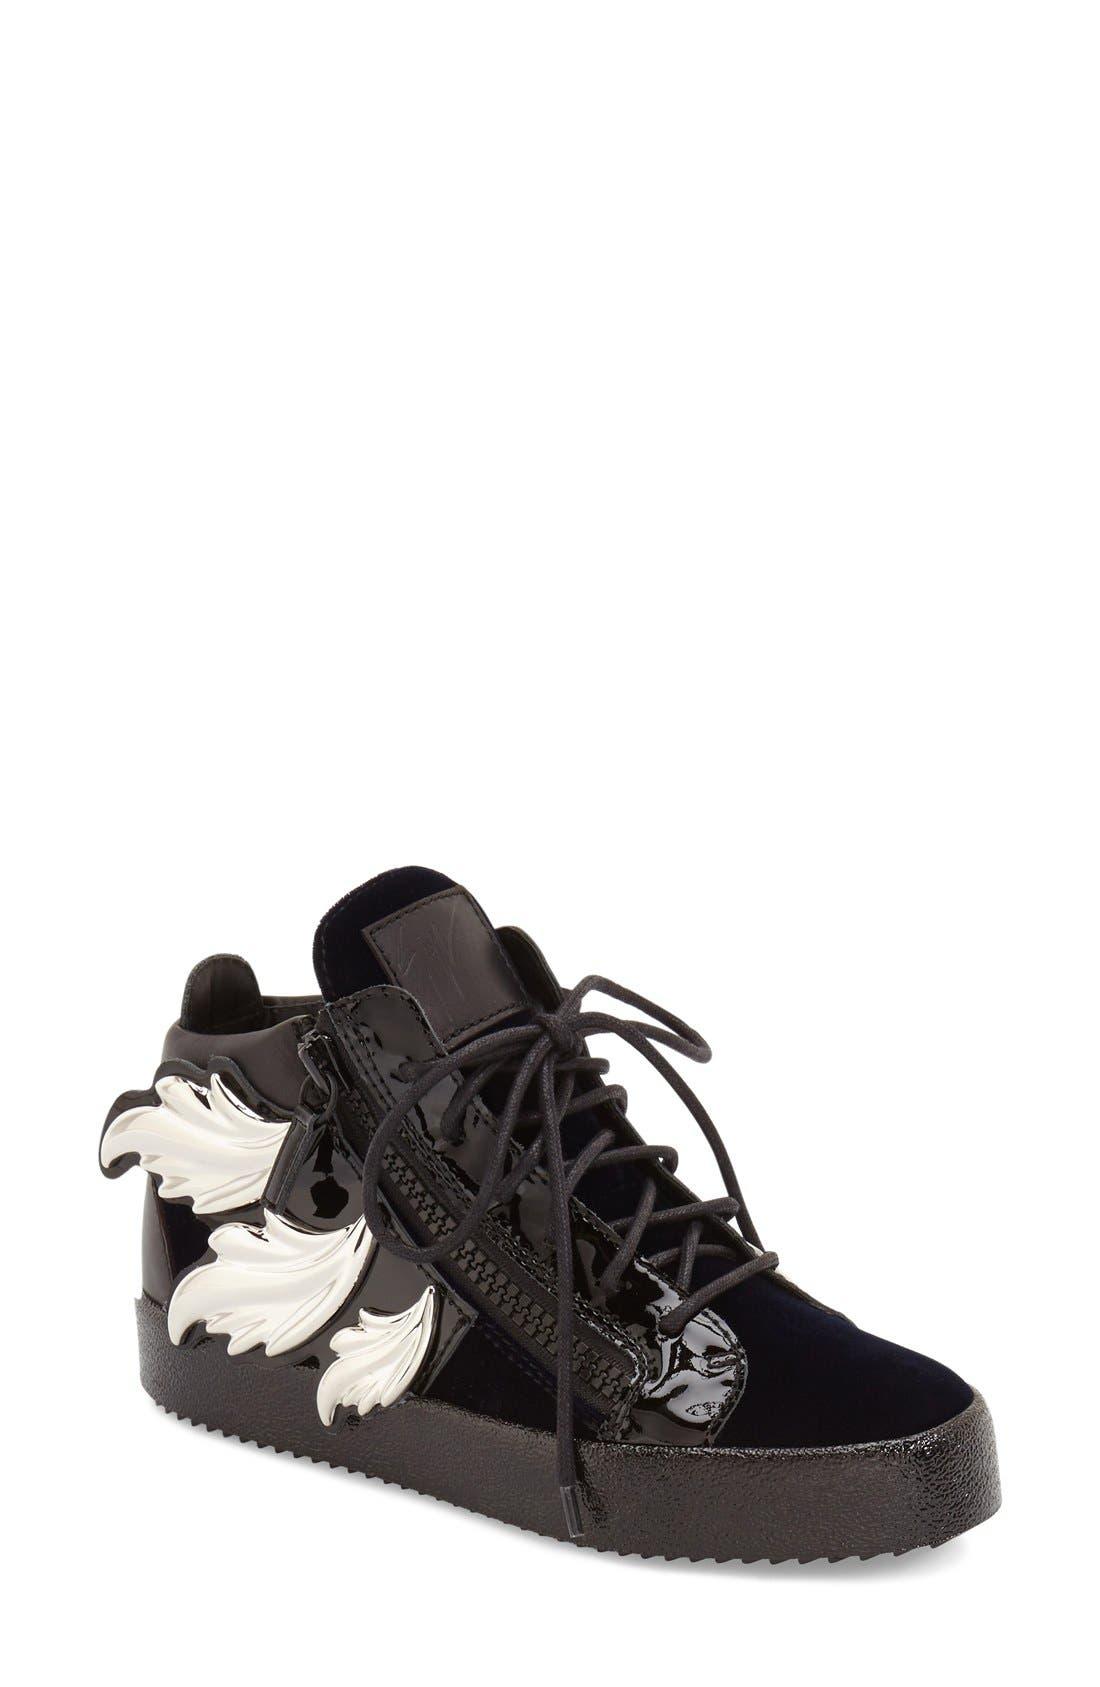 Main Image - Giuseppe Zanotti 'May London' High Top Sneaker (Women)